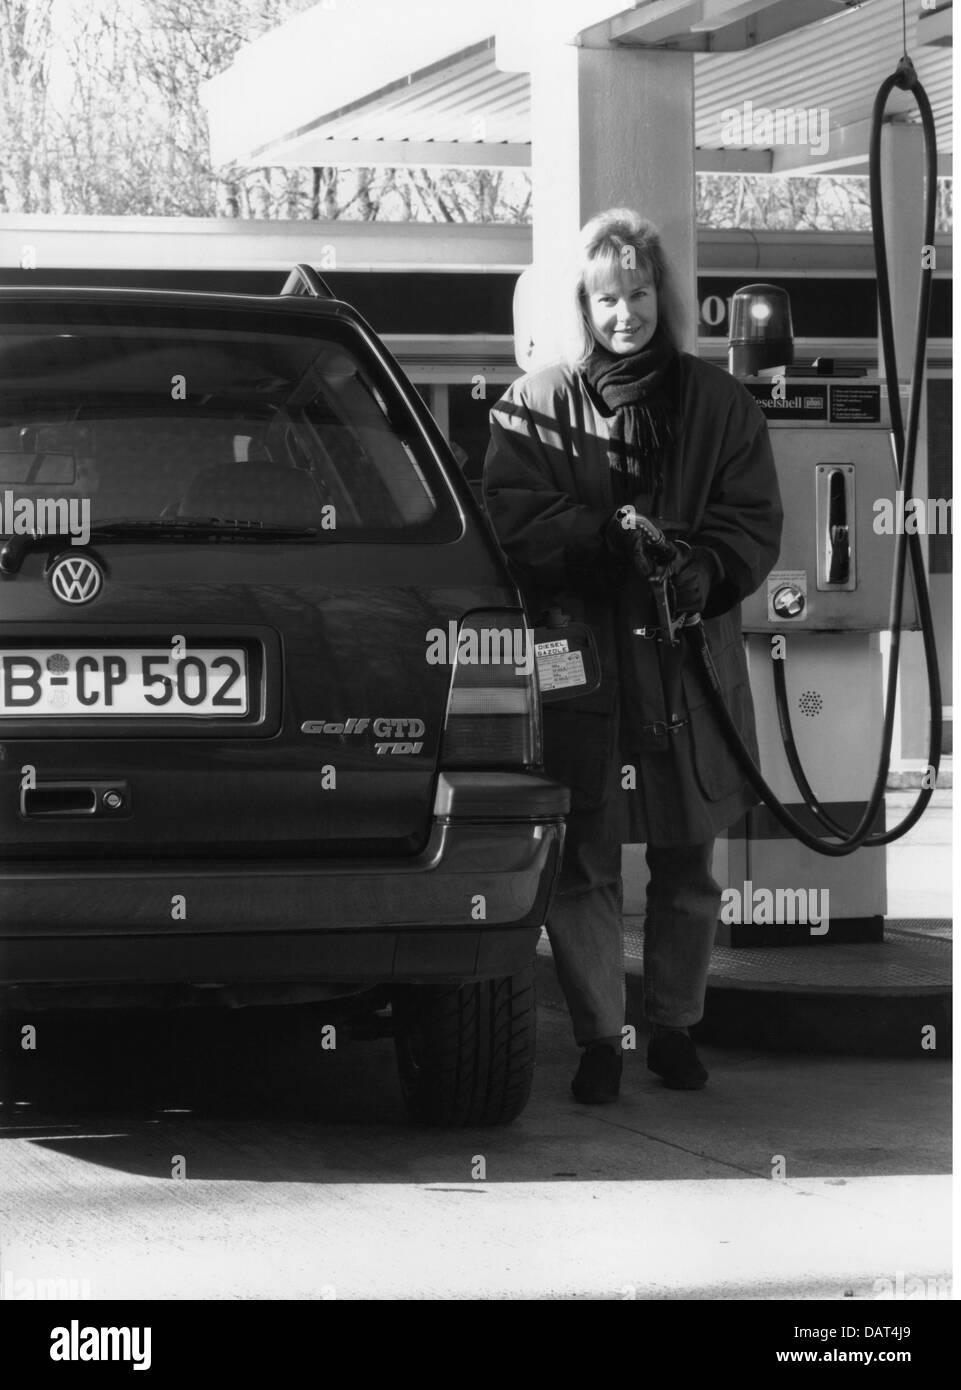 transport / transportation, car, vehicle variants, Volkswagen, VW Golf III GTD TDI at petrol station, 1990s, Additional Stock Photo